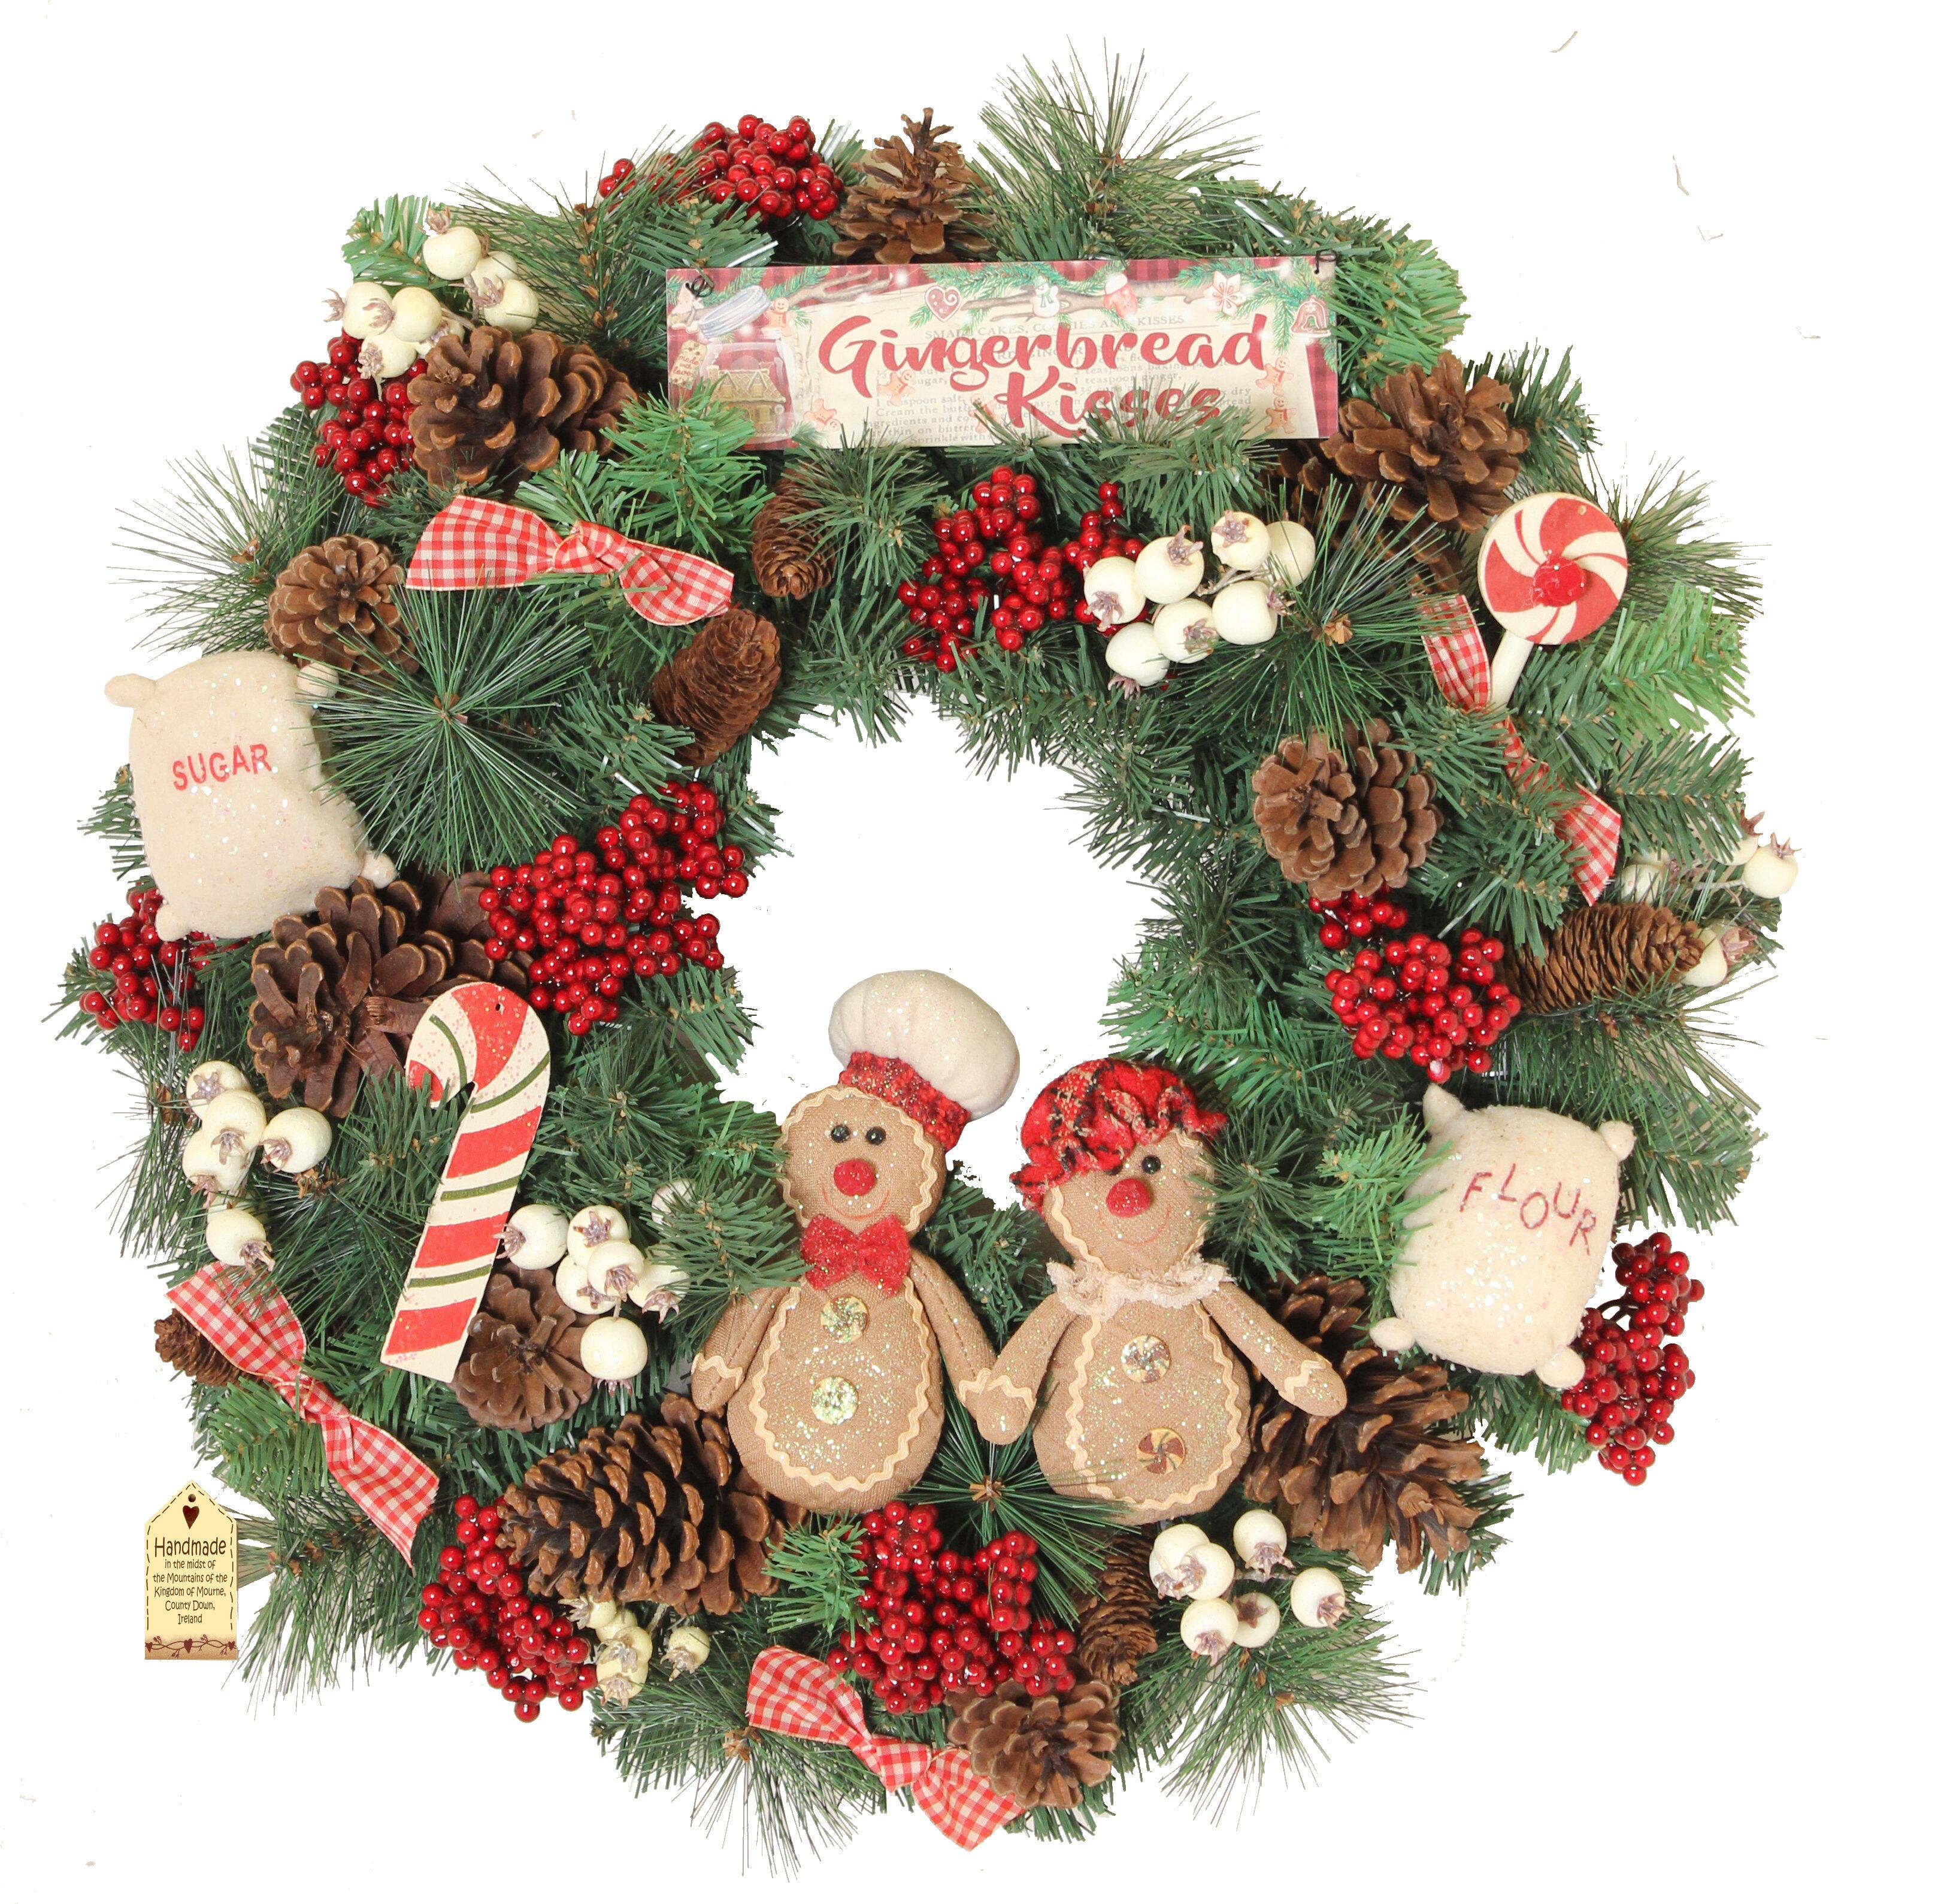 Christmas Wreath.Gingerbread Kisses 60cm Christmas Wreath